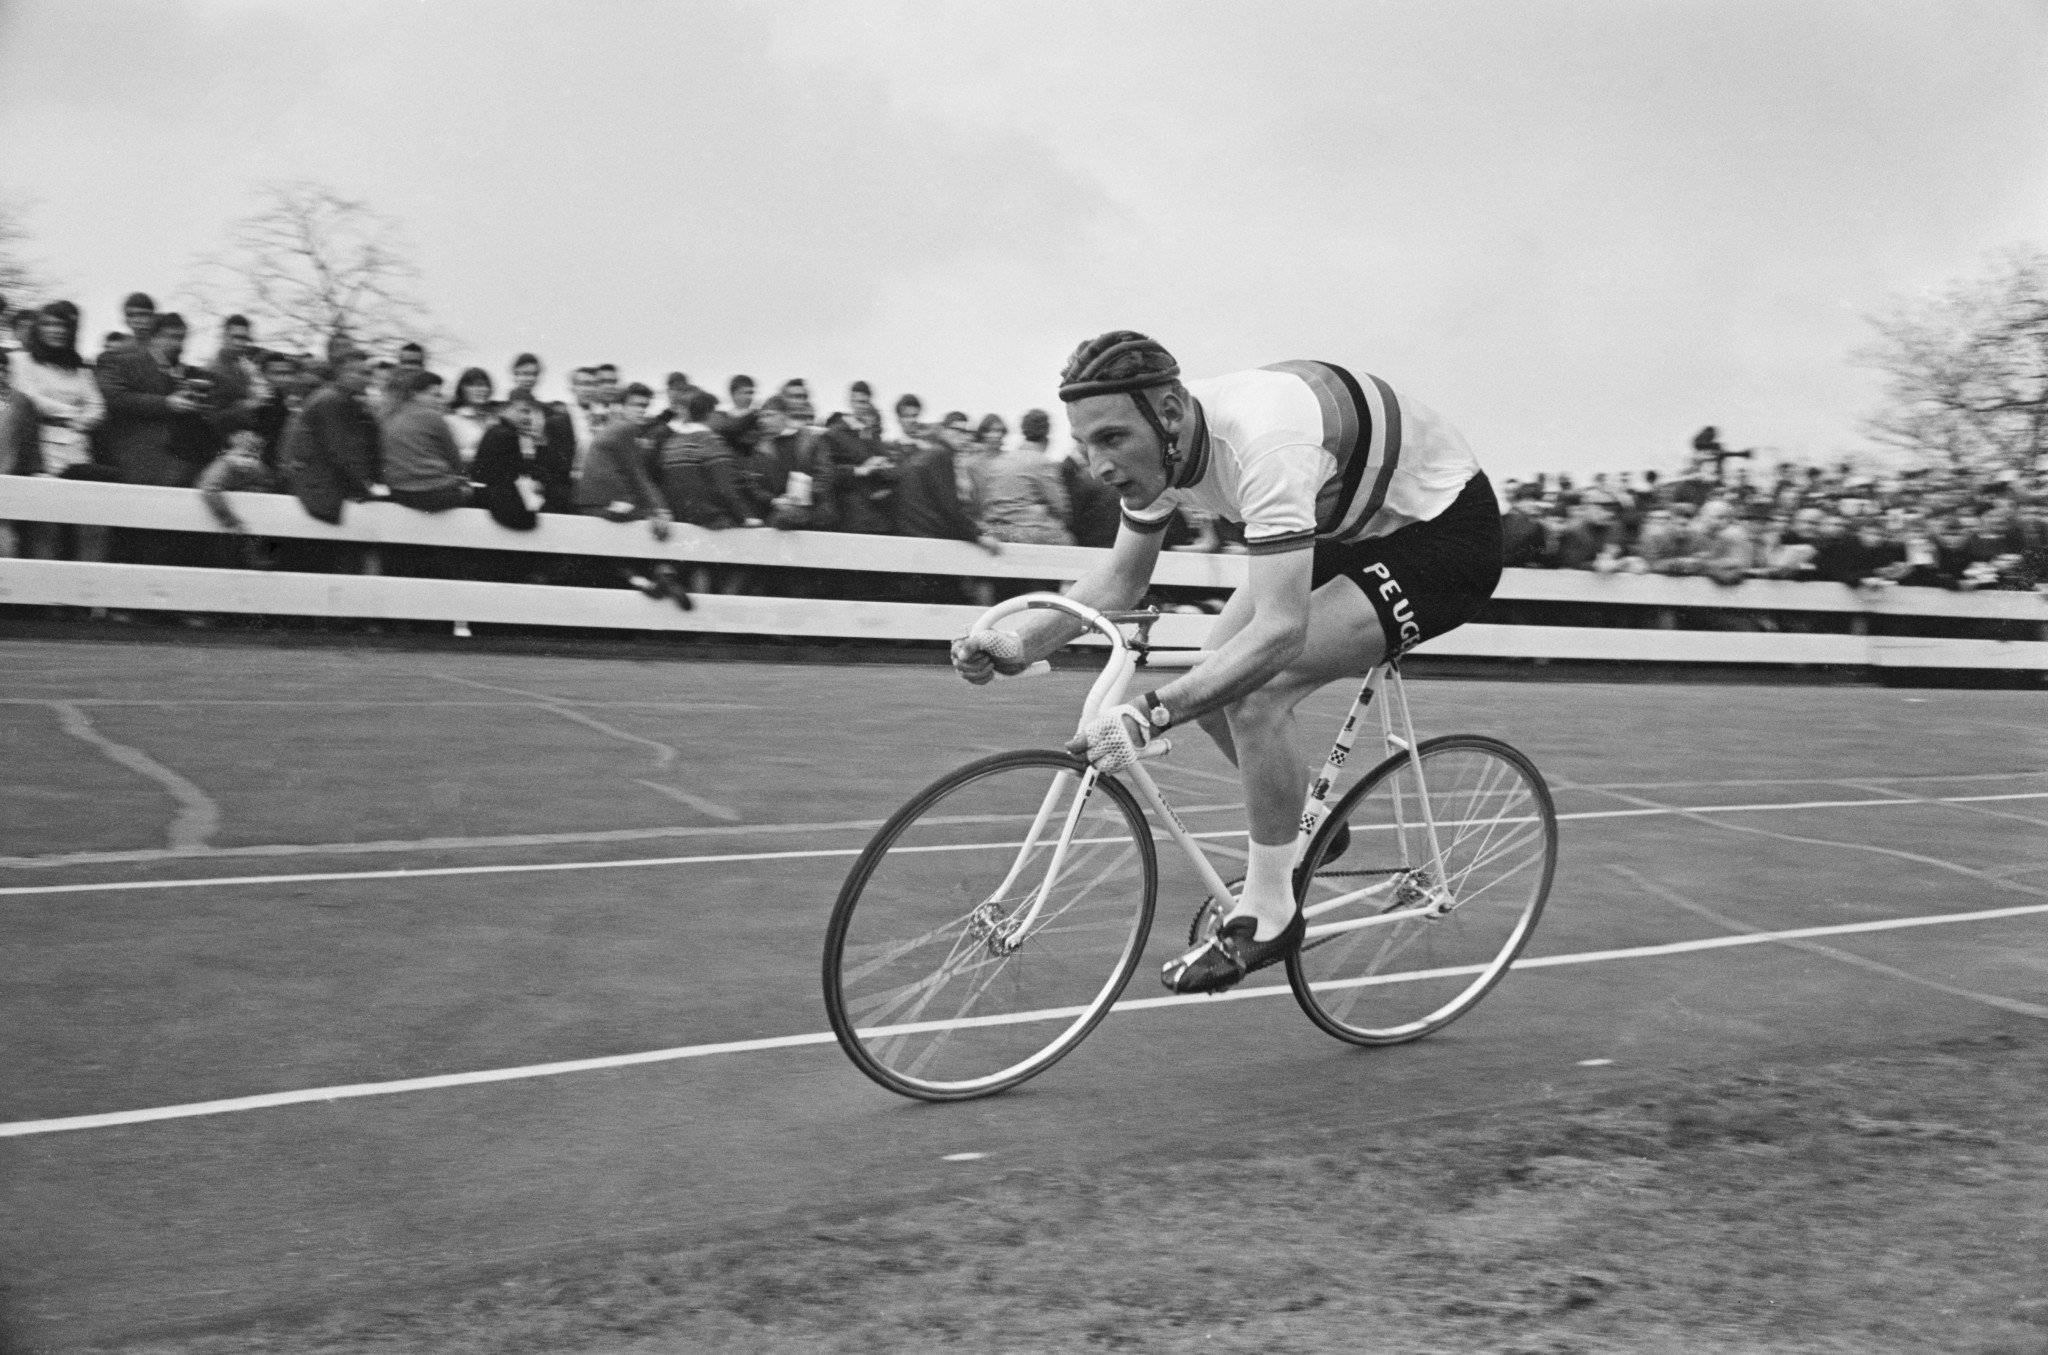 Wolverhampton's cycling ambassador Porter encourages public to take up sport prior to Birmingham 2022